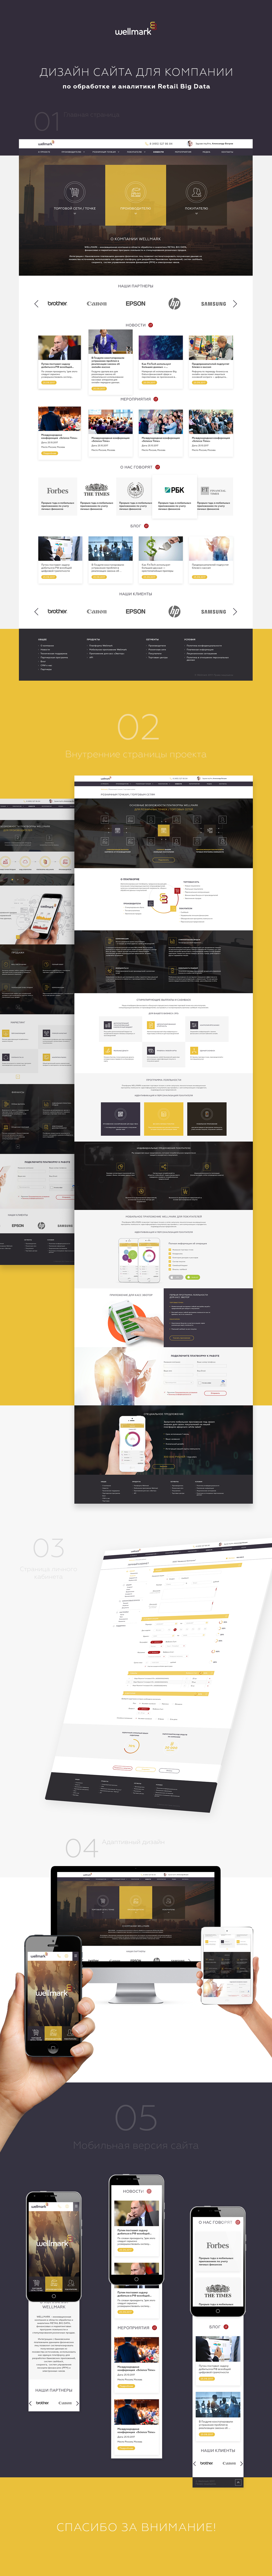 Адаптивный дизайн сервиса-агрегатора WELLMARK